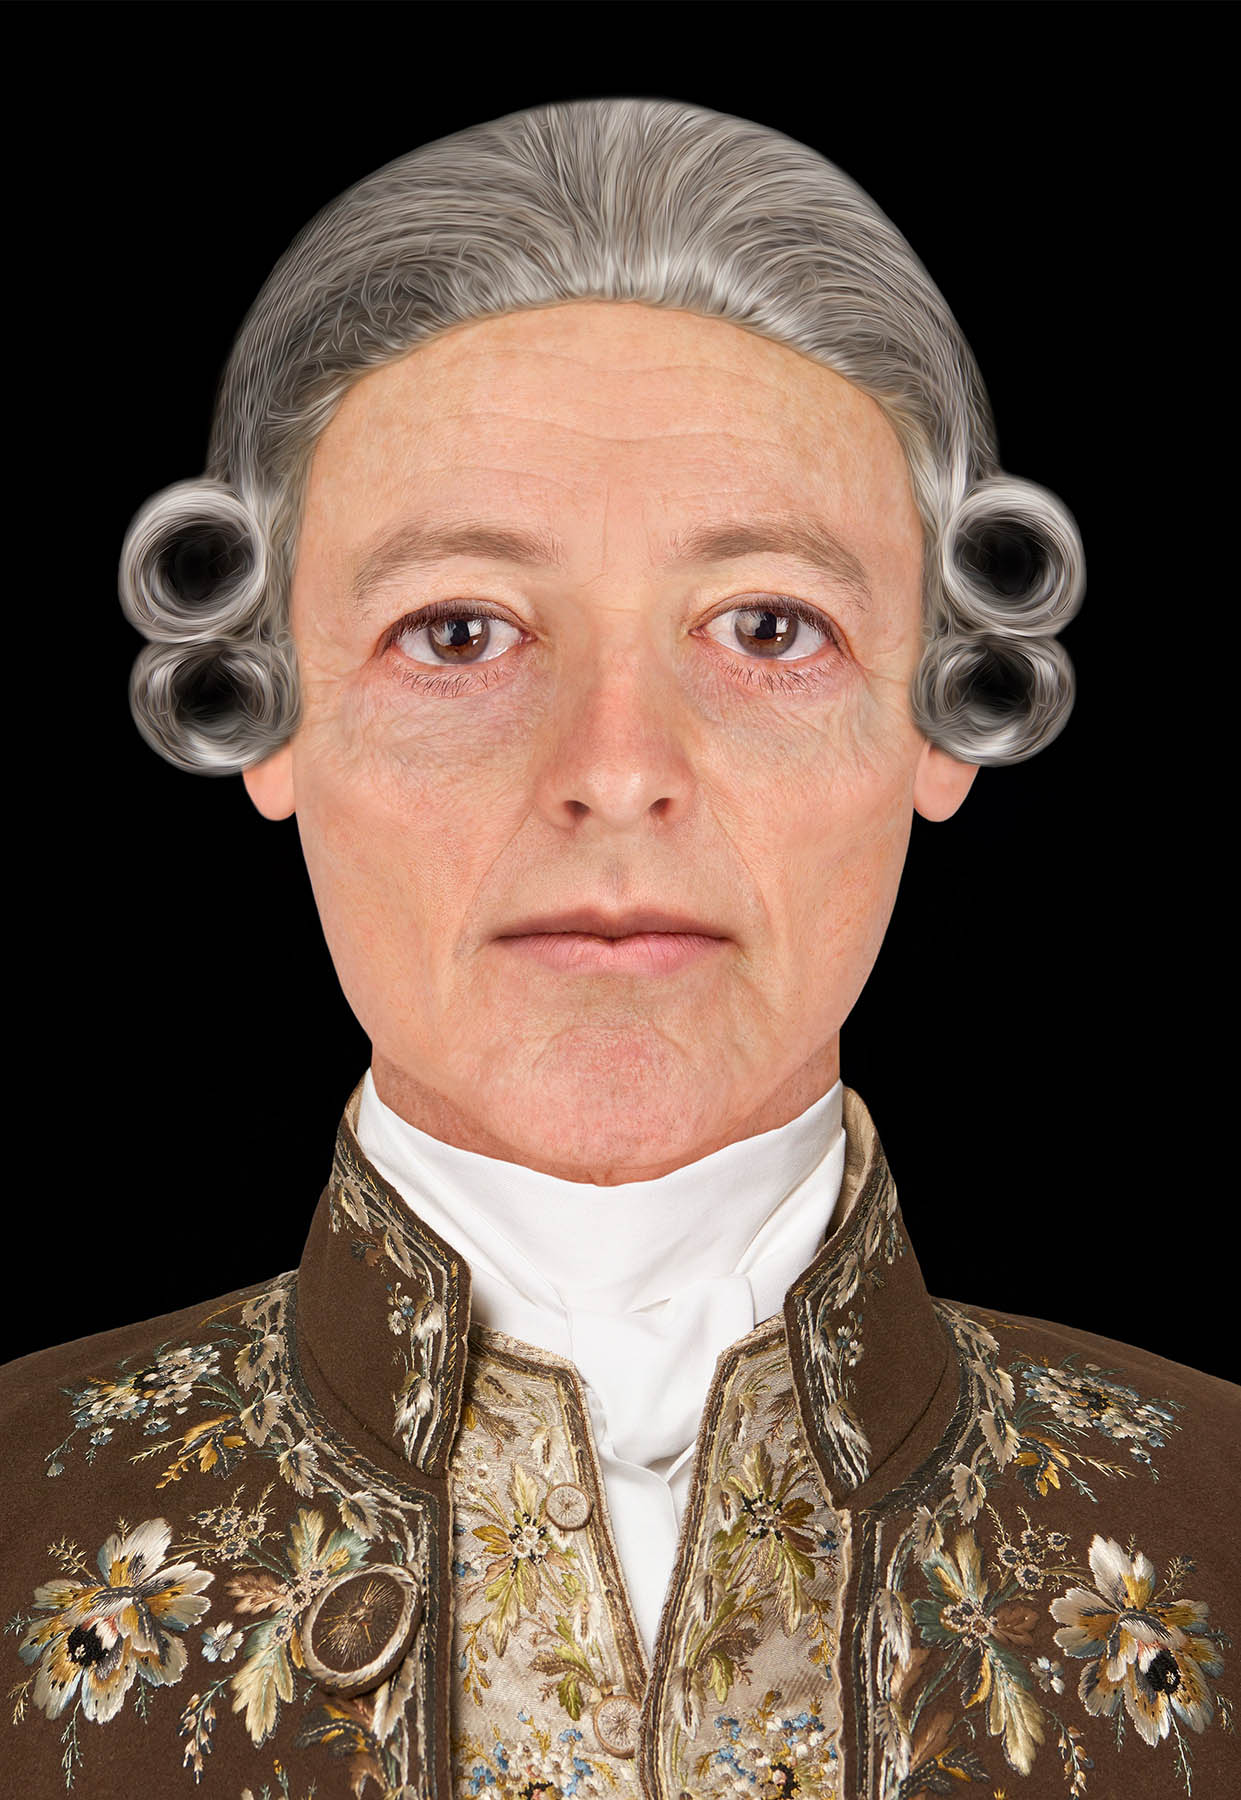 Charles Edward Stuart forensic facial depiction by Hew Morrison